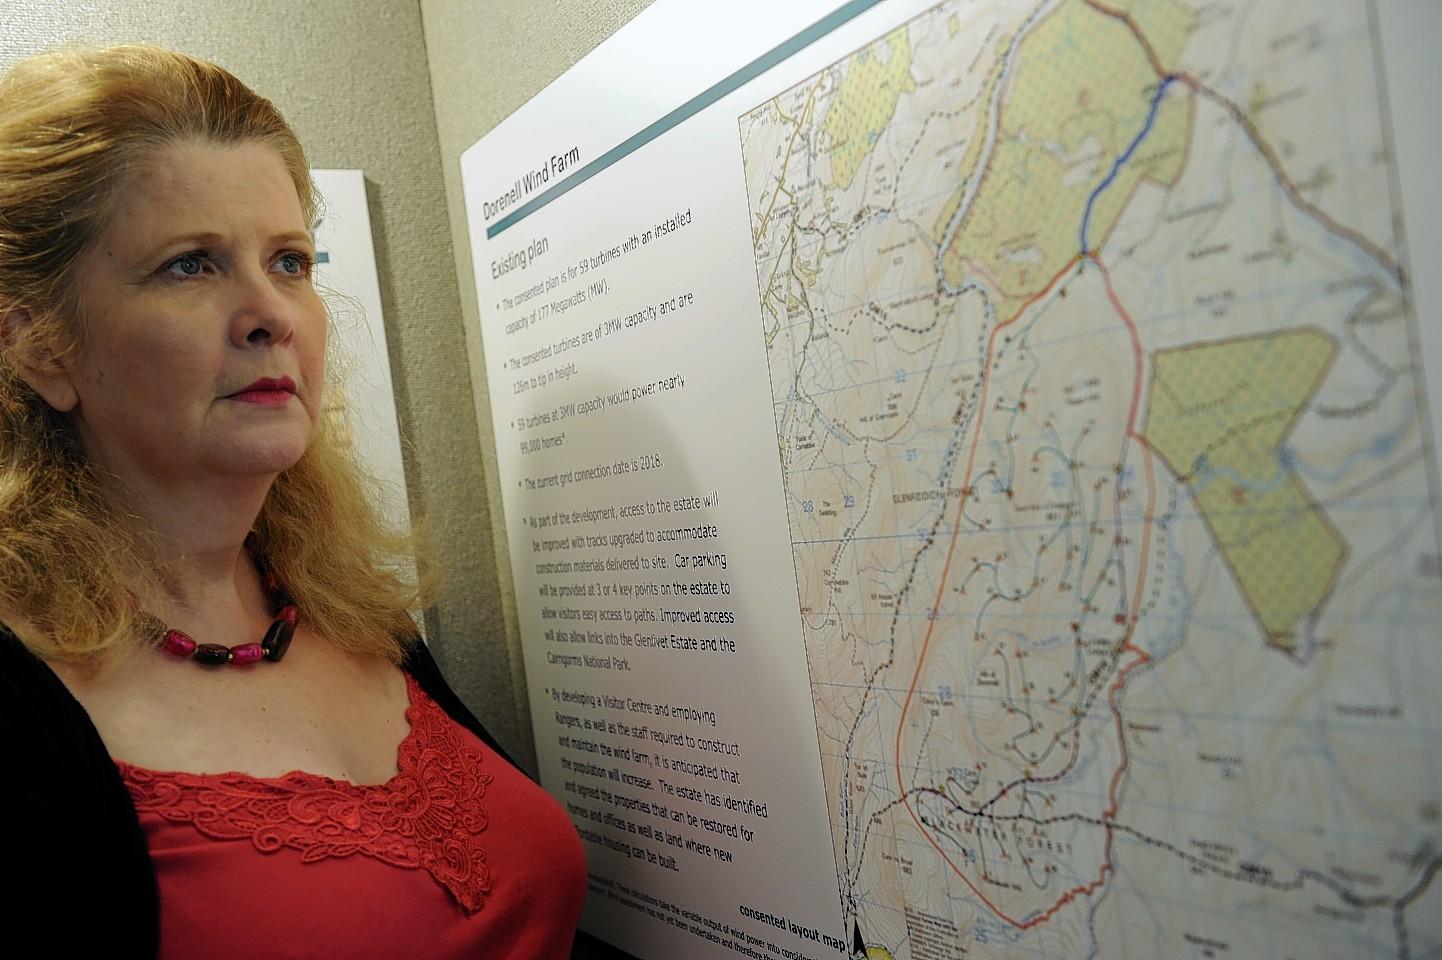 Patti Nelson of the Cabrach Community Association